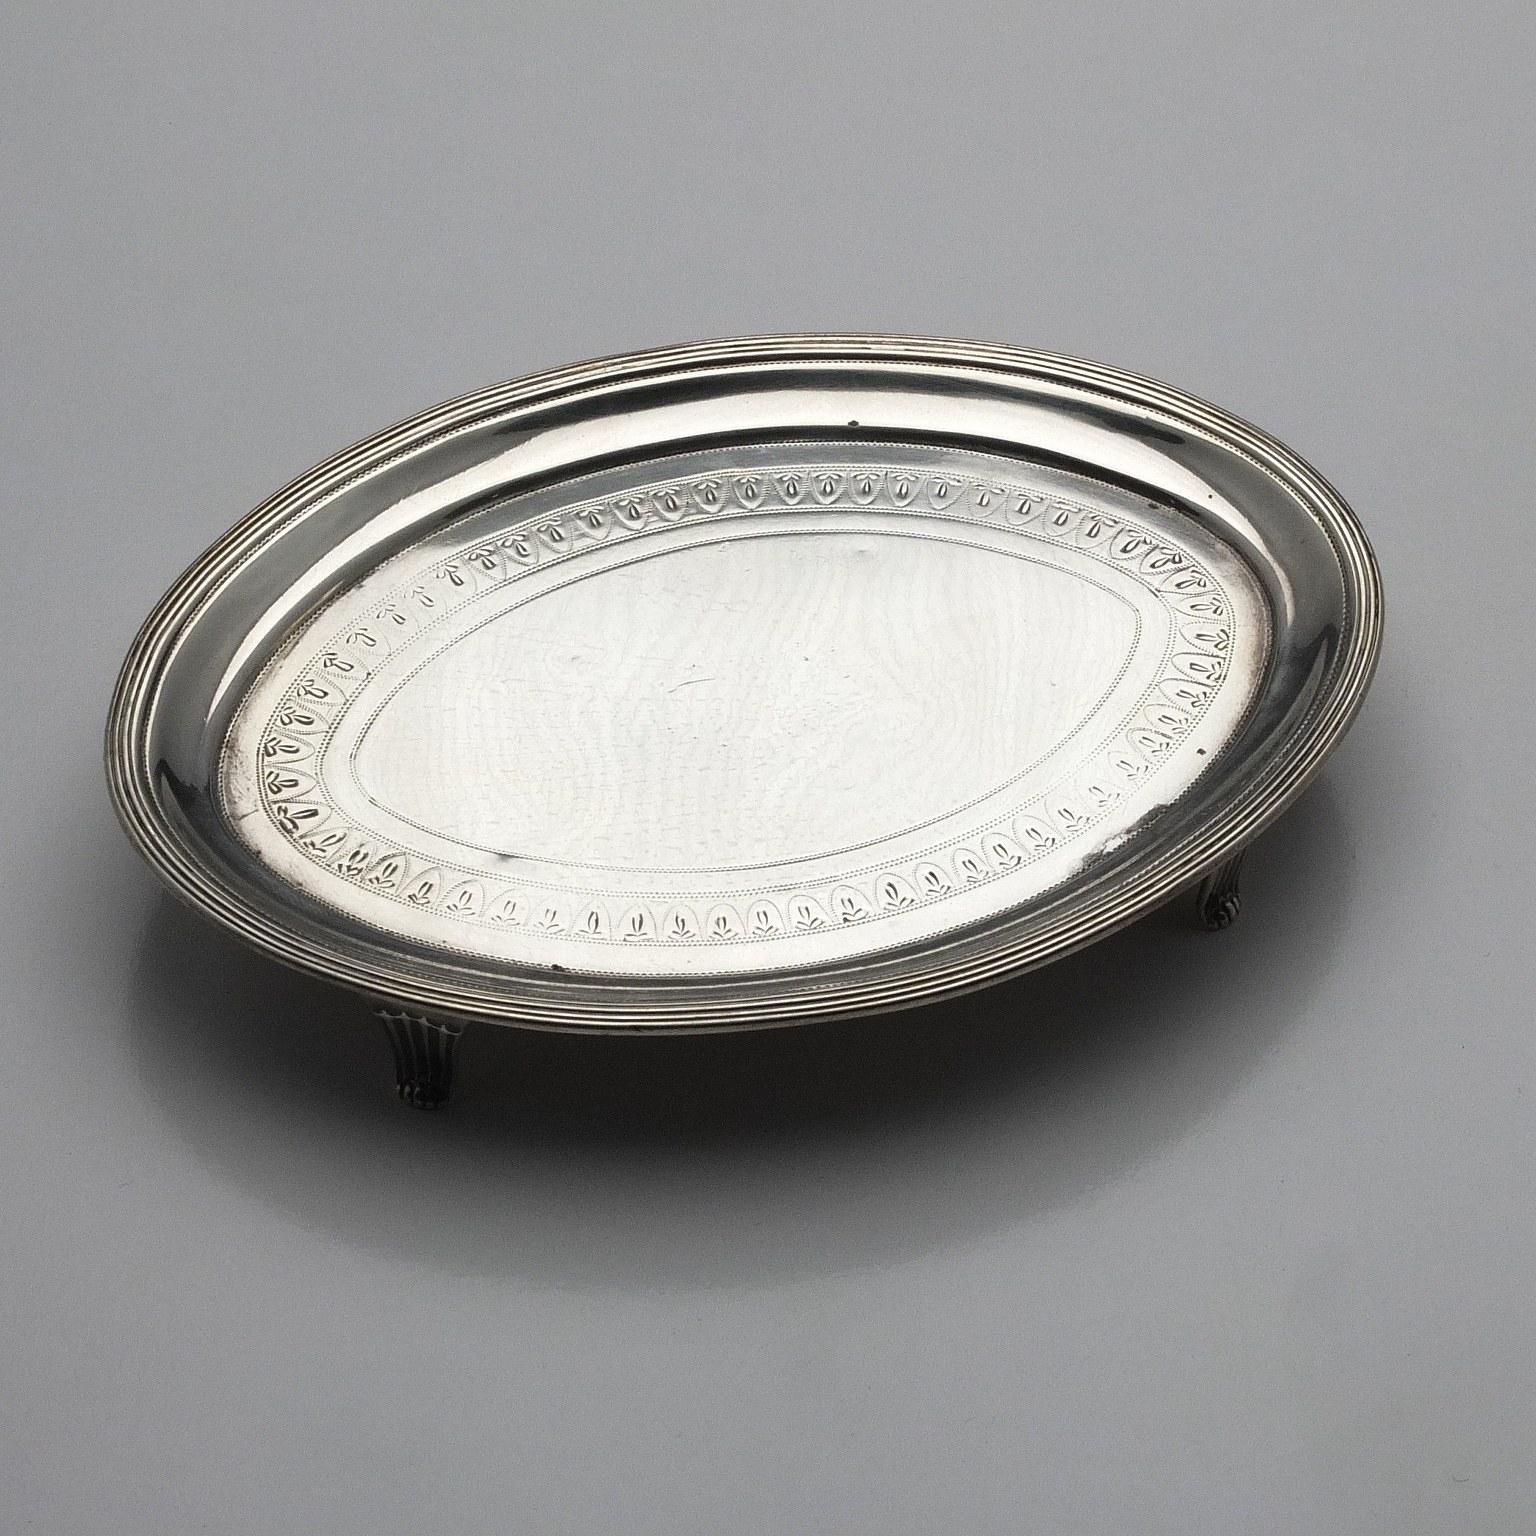 'George III Sterling Silver Bright Cut Trivet Peter, Ann & William Bateman London 1801'